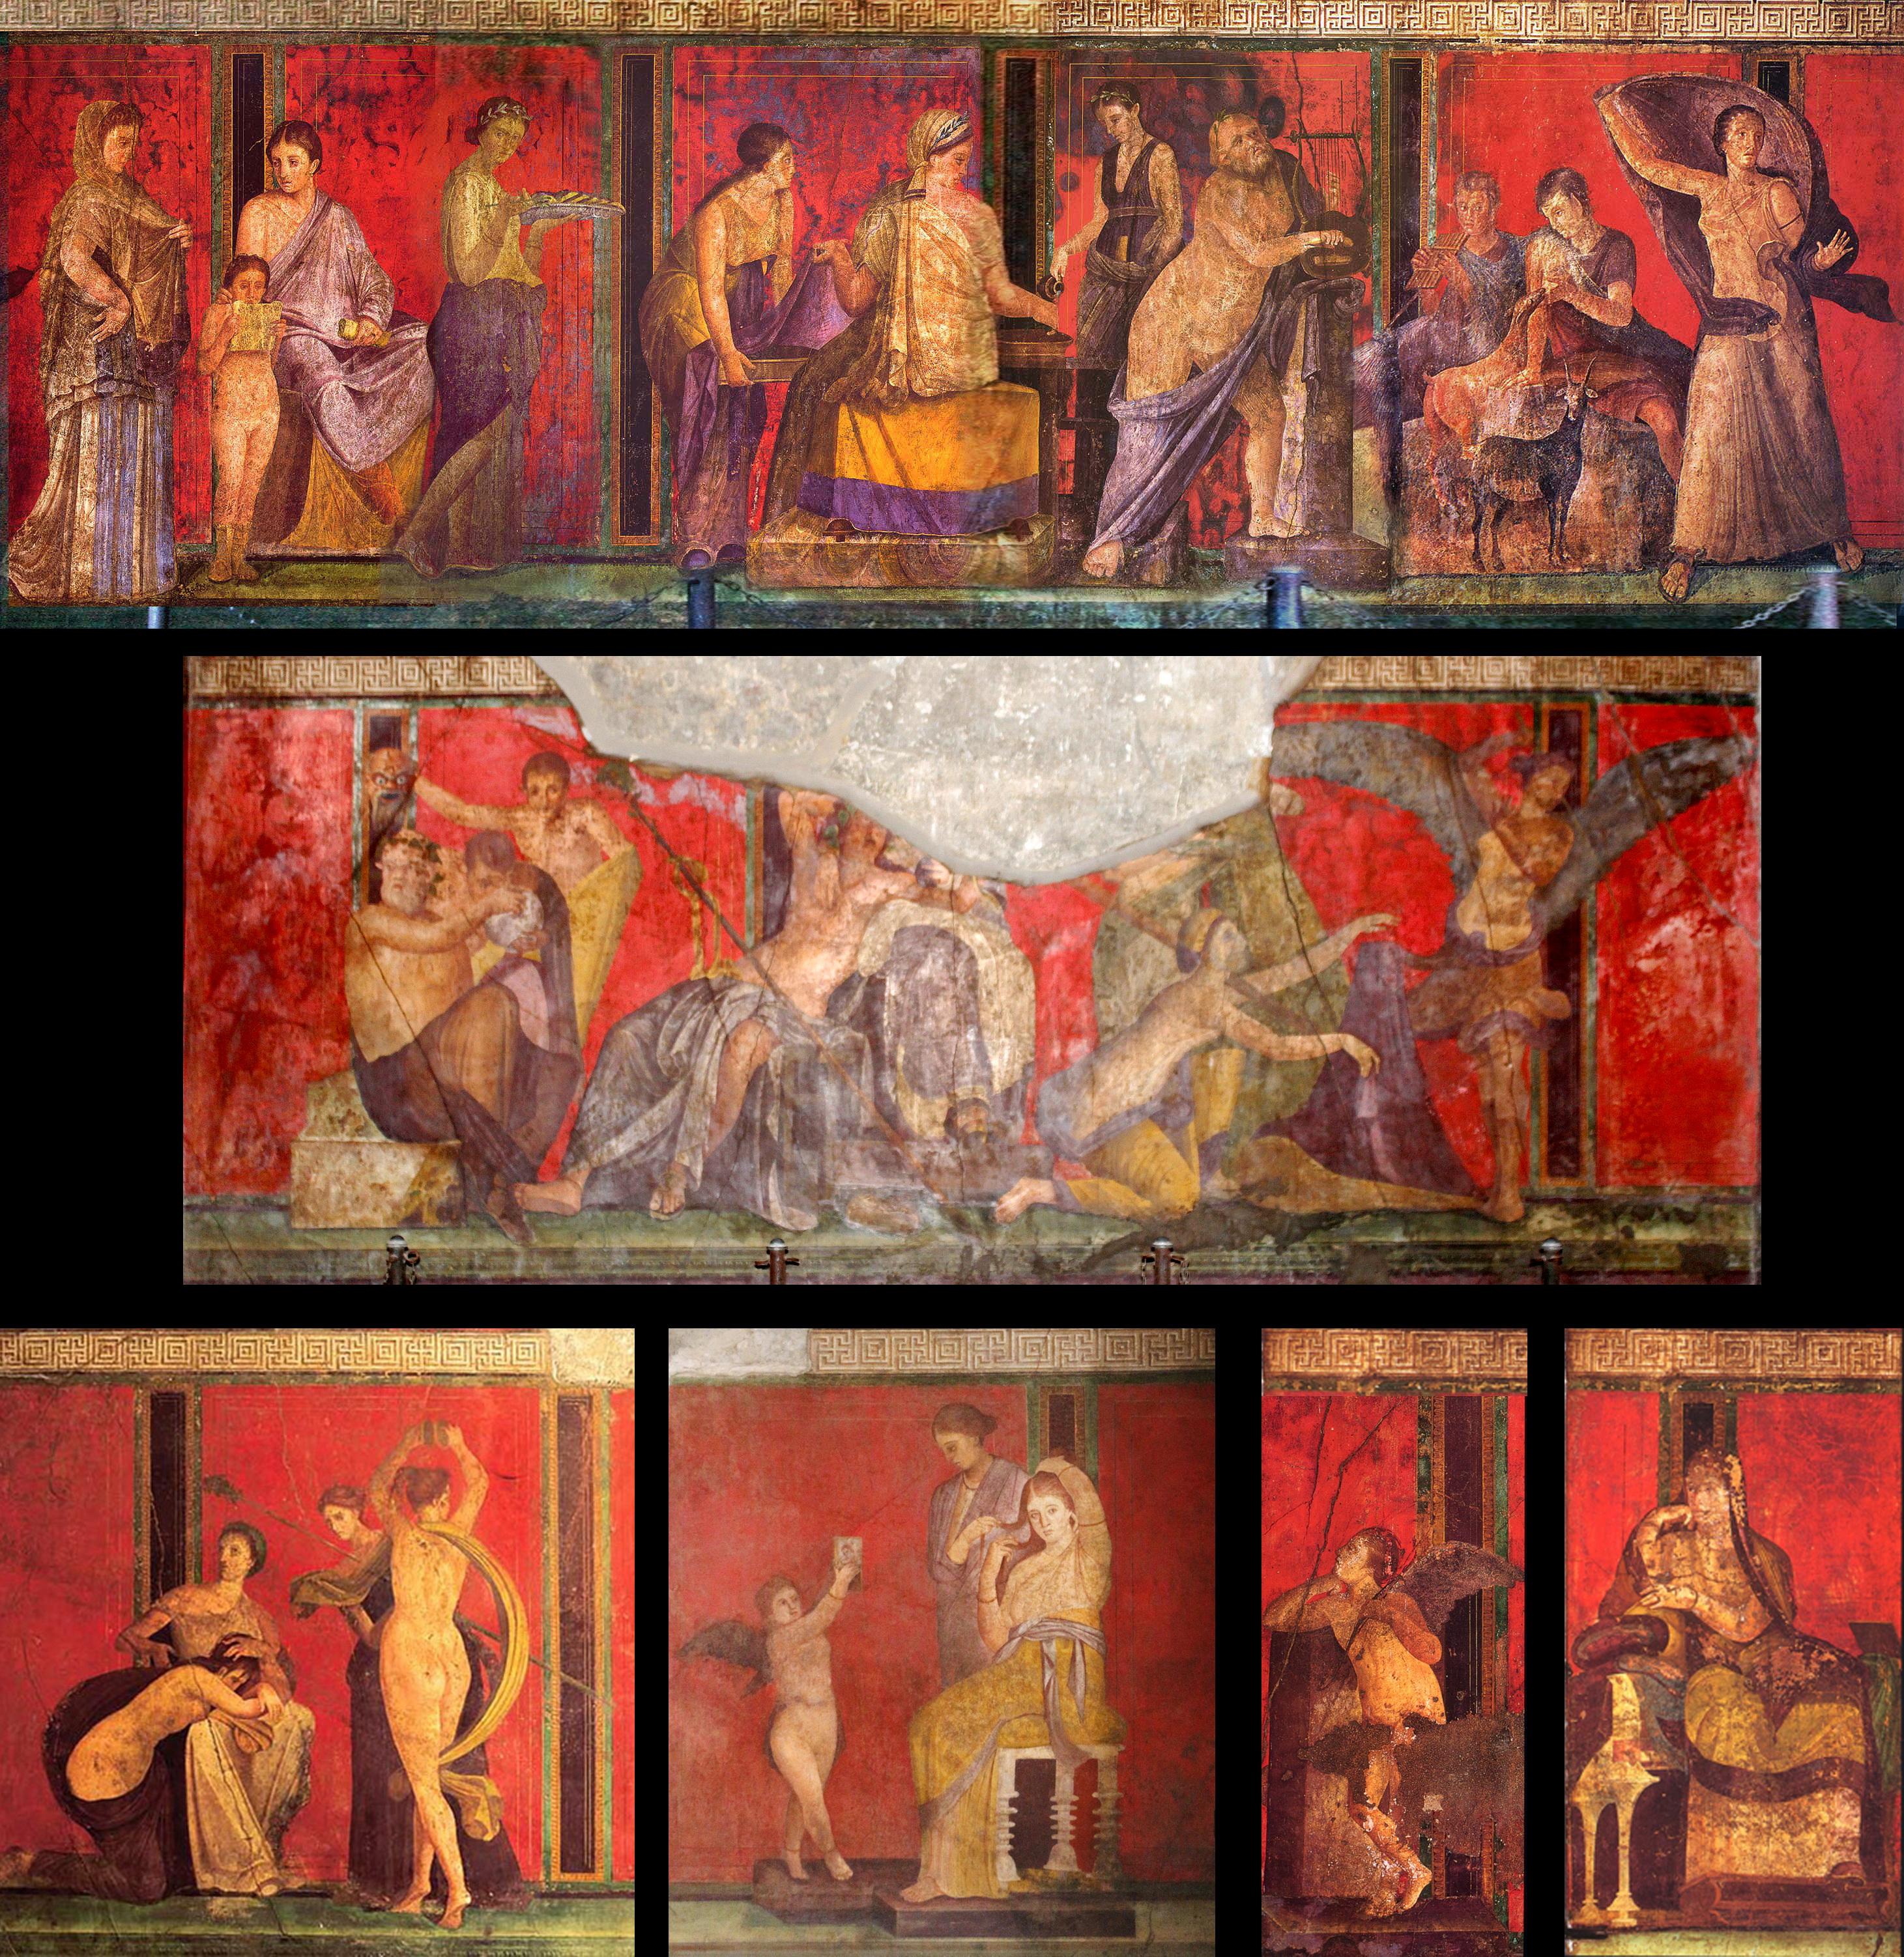 https://upload.wikimedia.org/wikipedia/commons/1/11/Villa_of_the_Mysteries_%28Pompeii%29_-_frescos_02.jpg